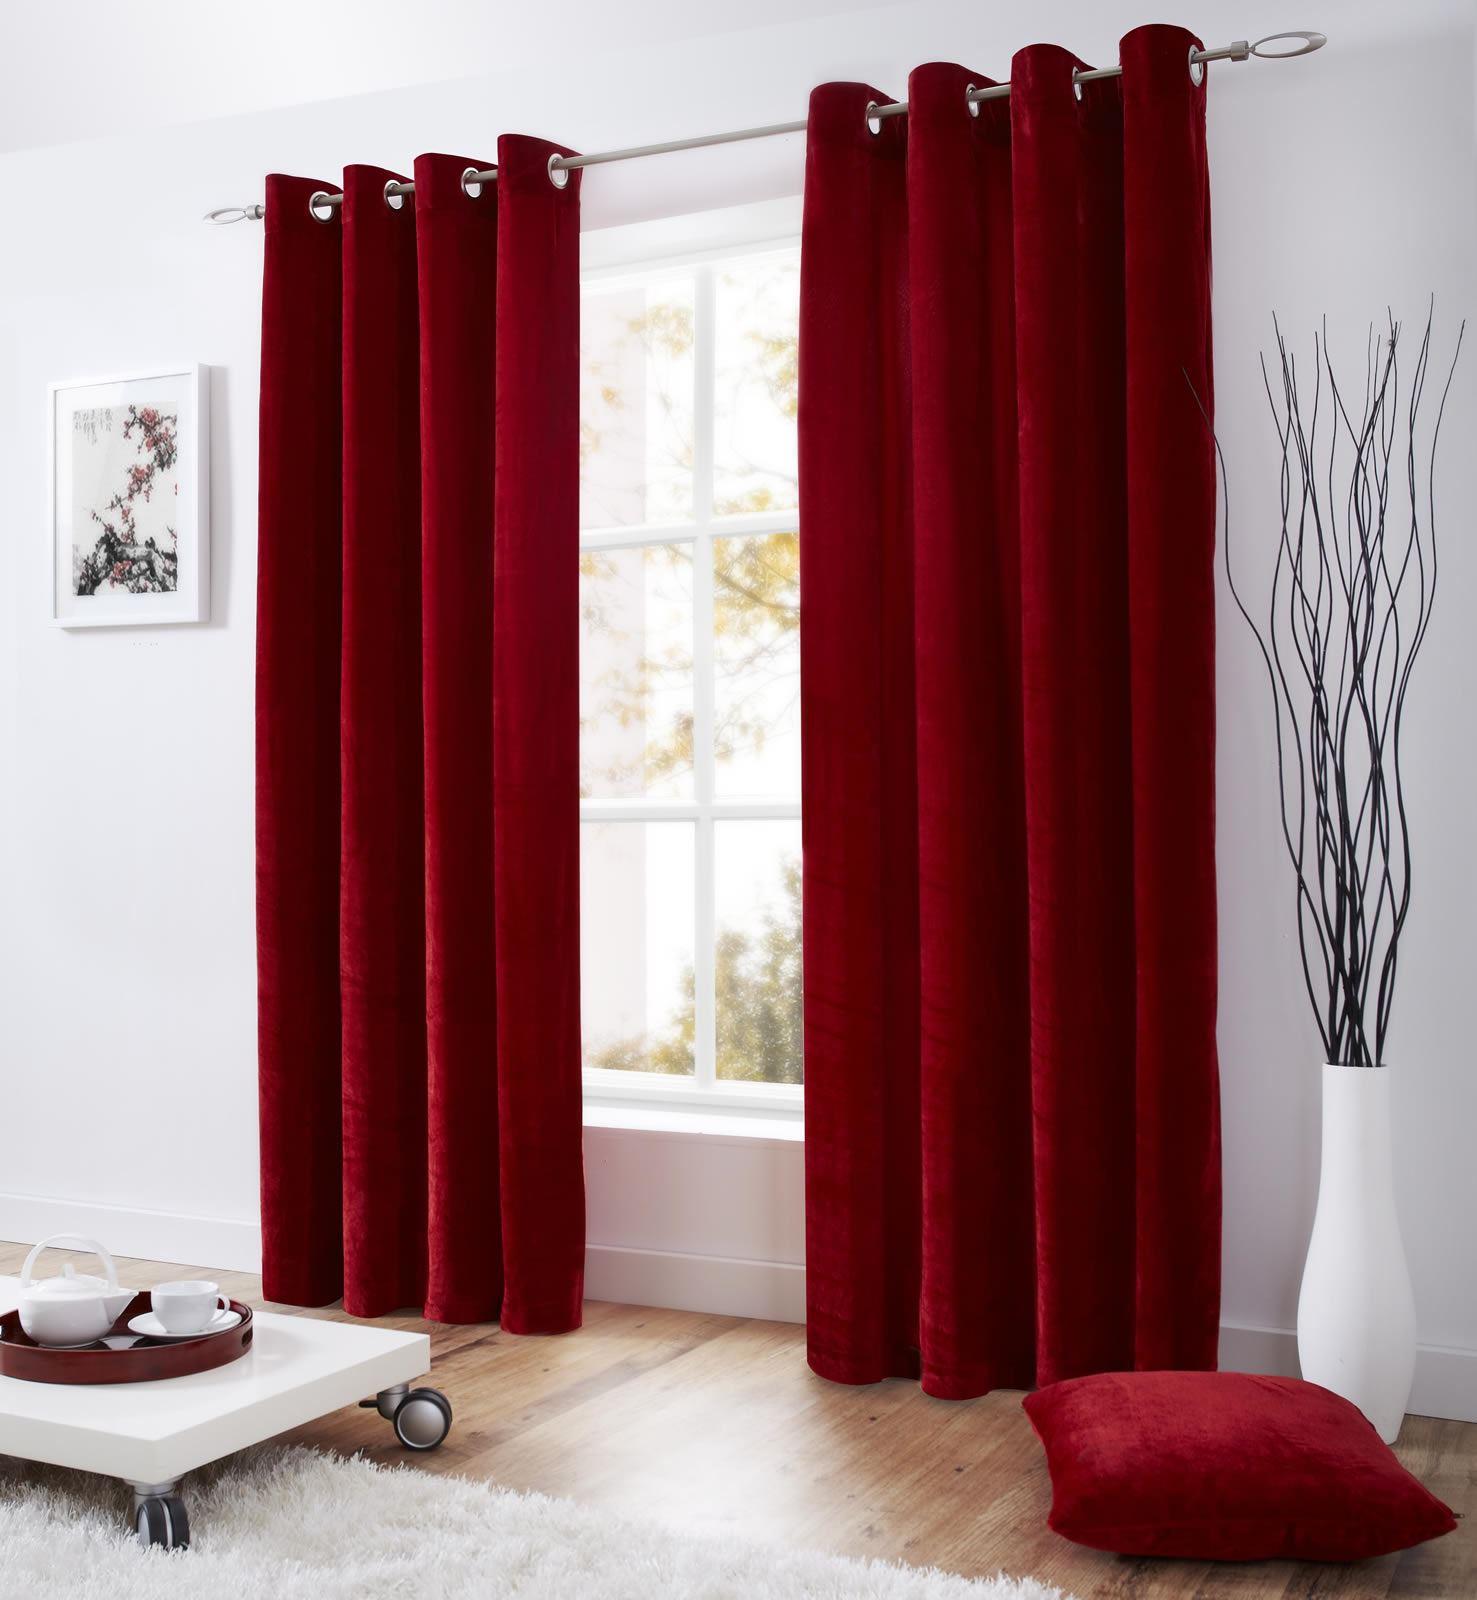 Velvet Eyelet Lined Curtains Ready Made Ringtop Curtain